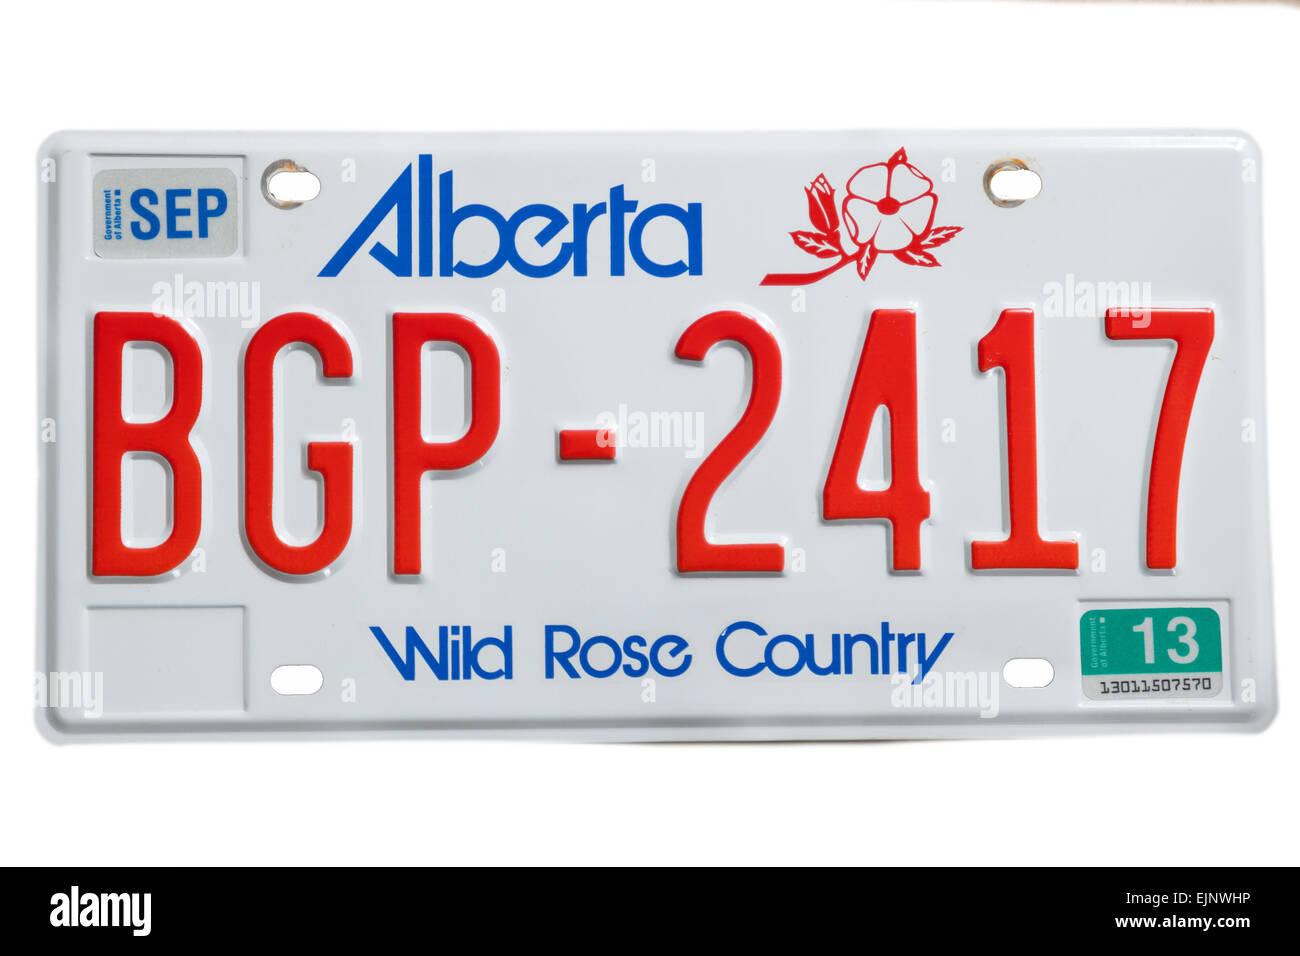 Vehicle registration plates of Arkansas - Wikipedia